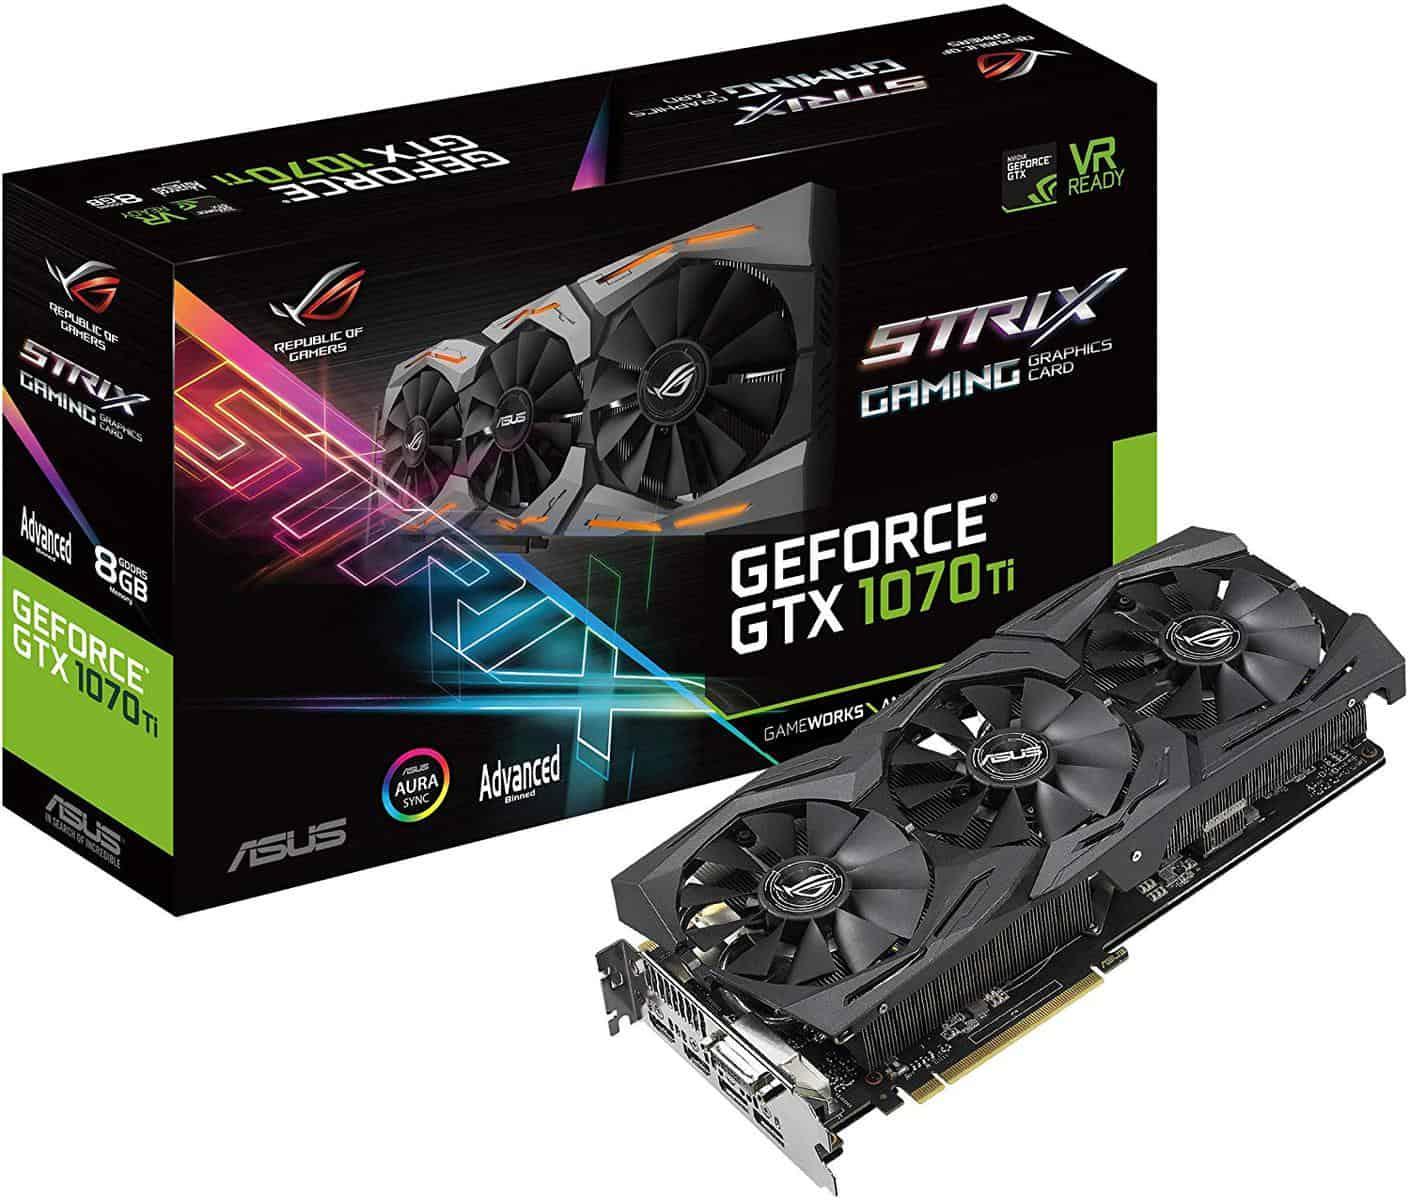 ASUS ROG Strix GeForce GTX 1070 Ti Advanced Edition 8GB